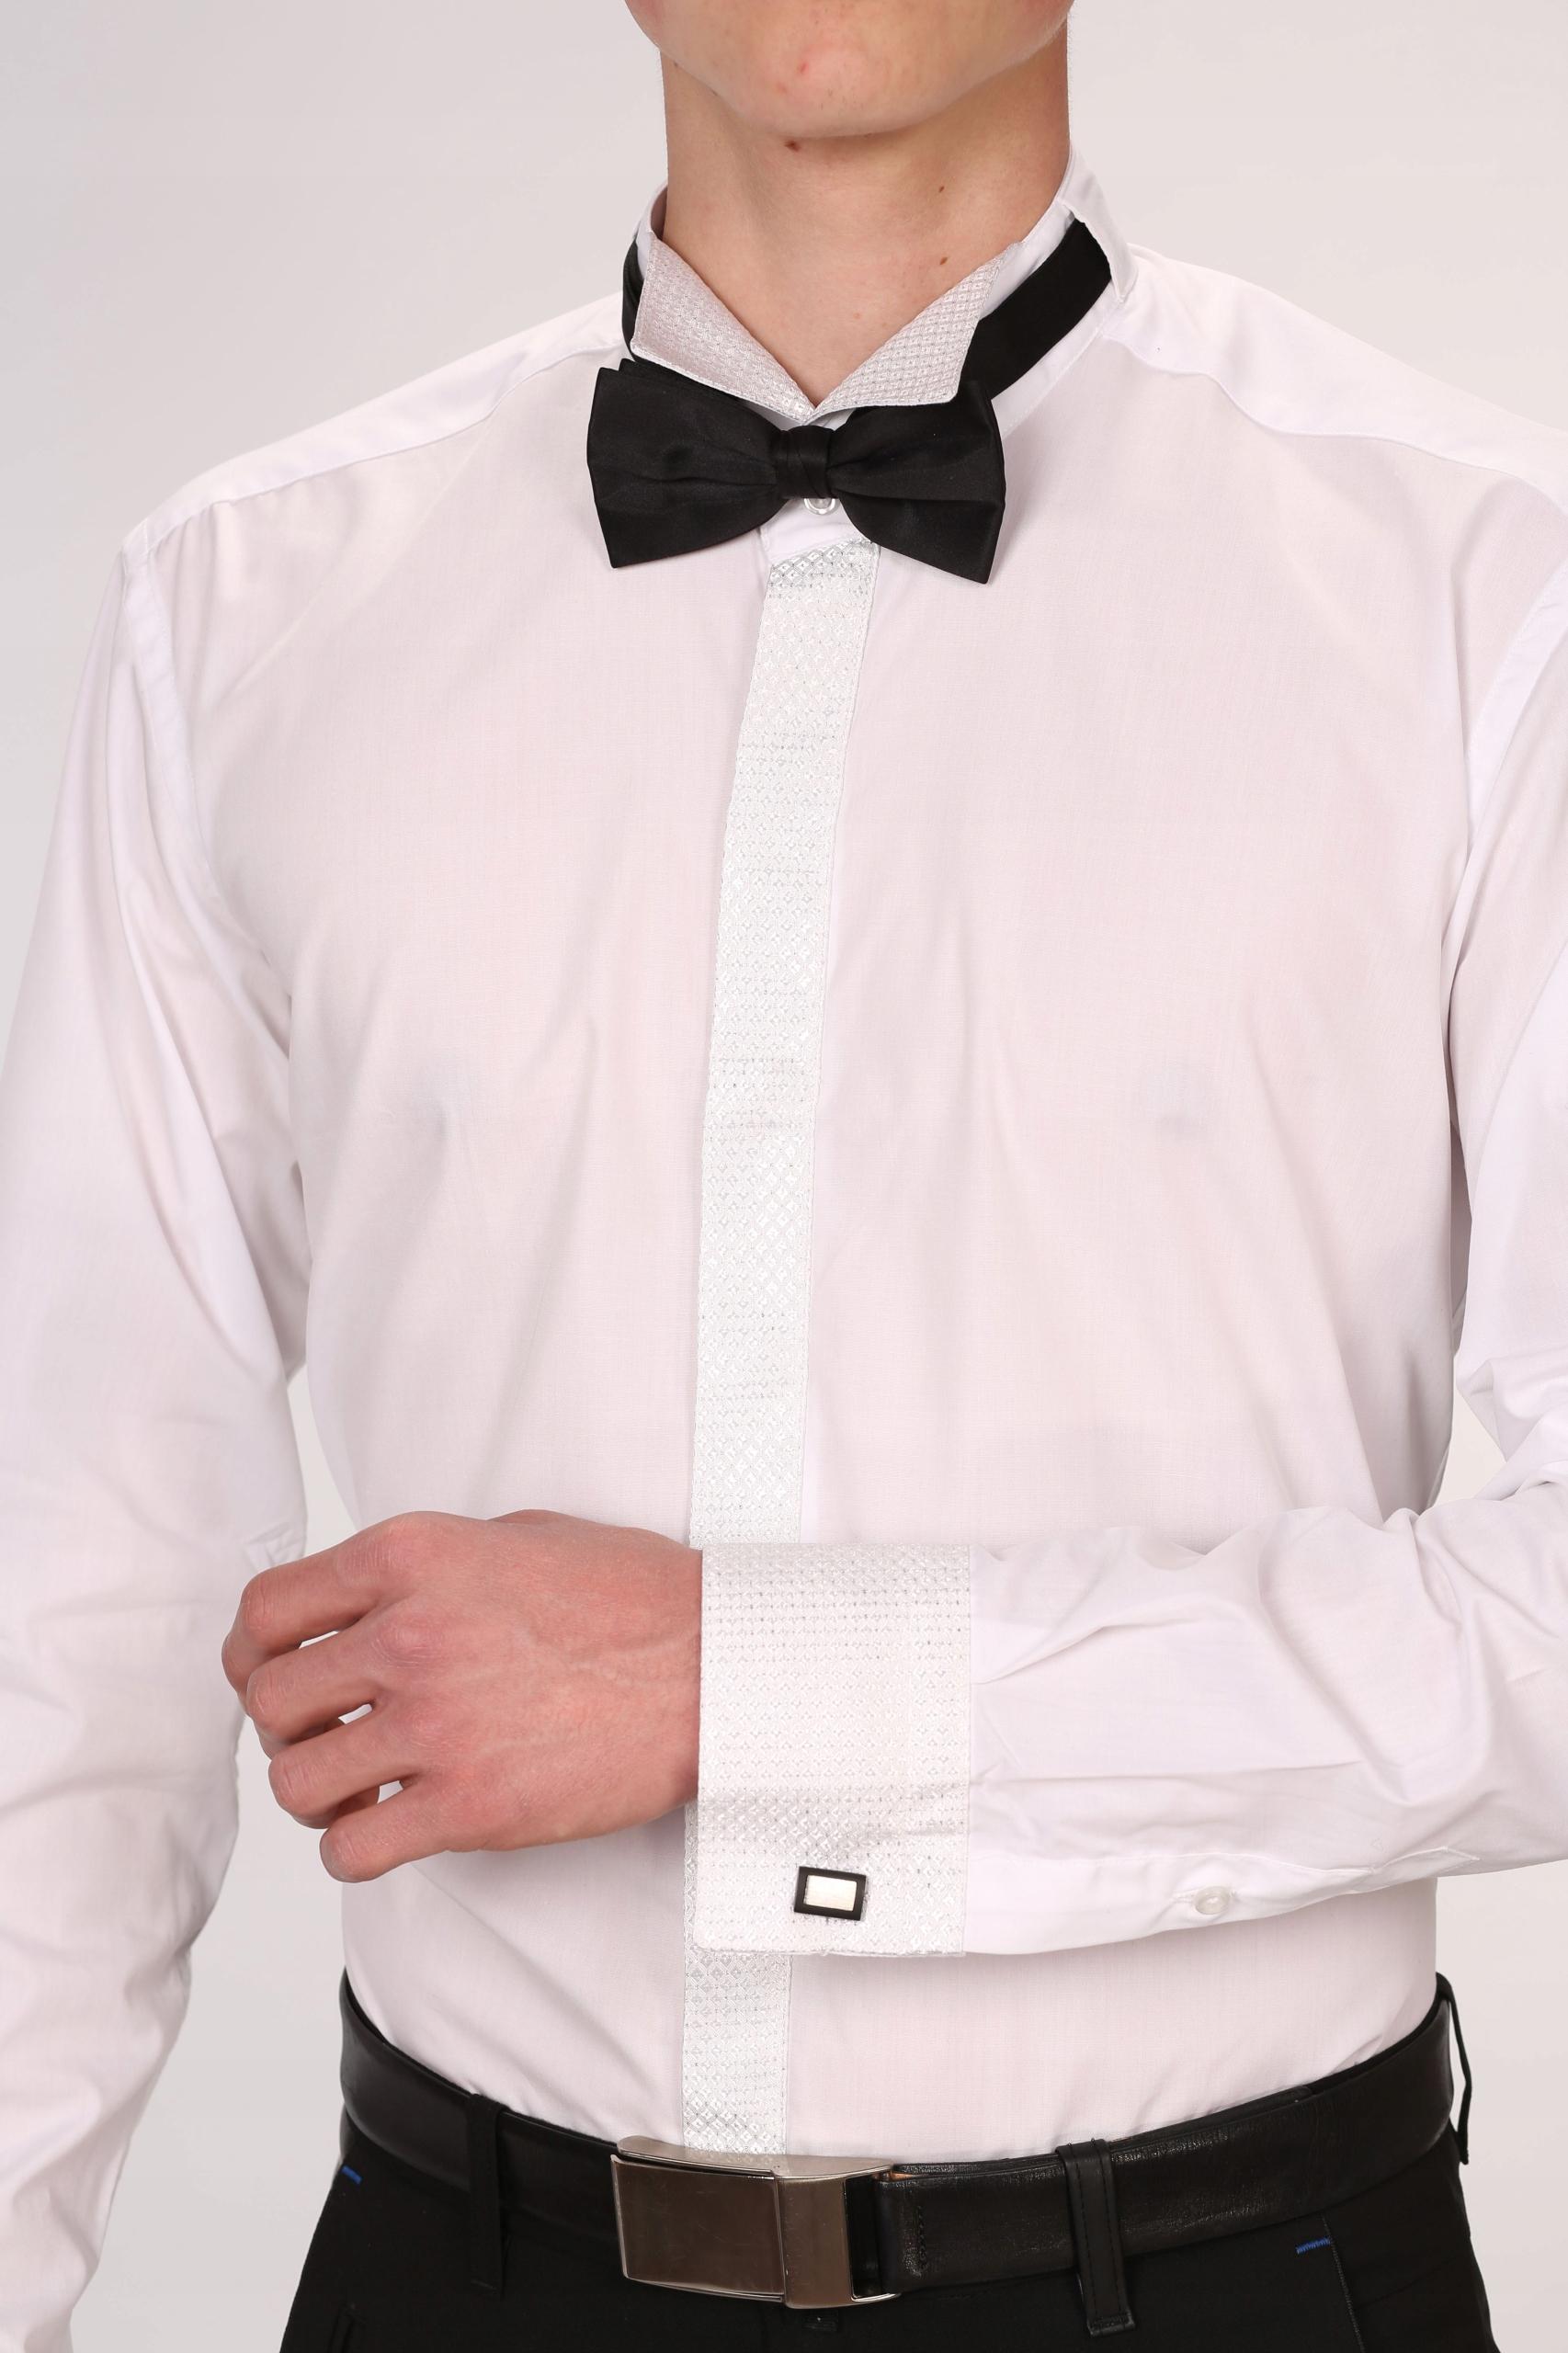 KOSZULA męska DO MUCHY 3XL długi rękaw, elegancka